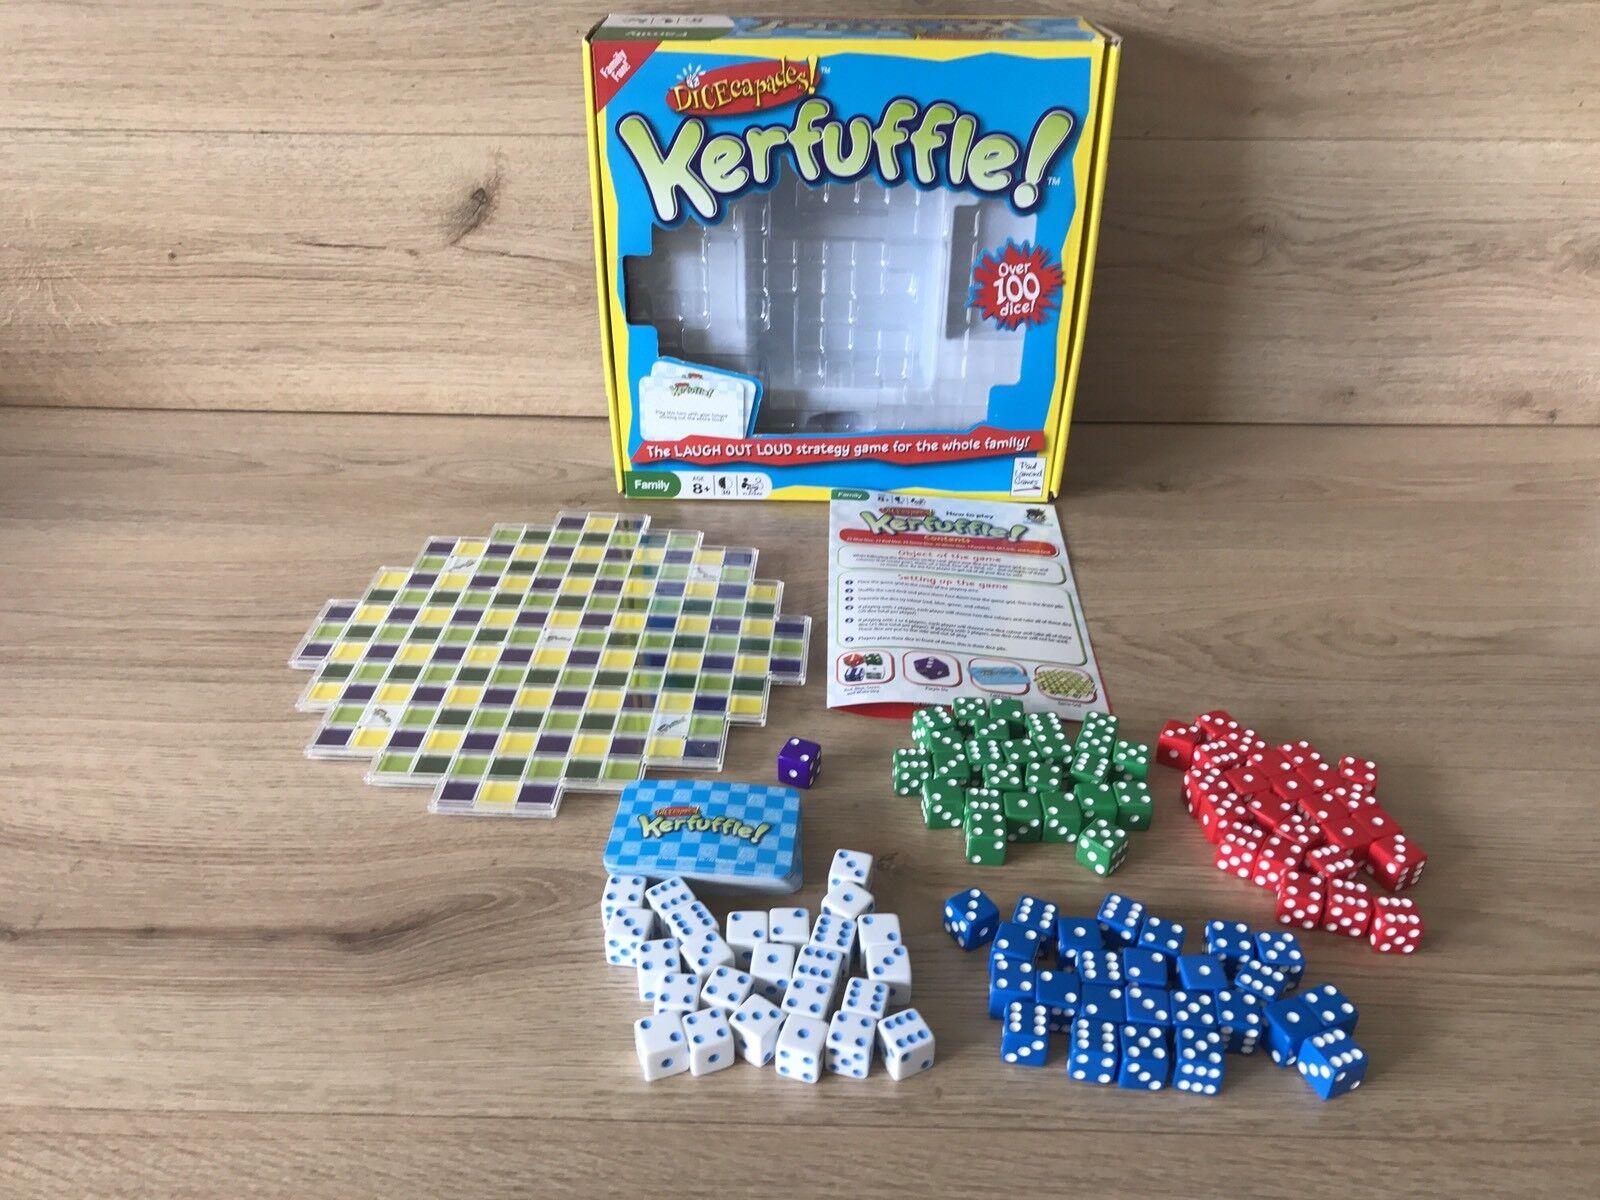 Paul Lamond Games - Dicecapades - Kerfuffle  Game (2012) Complete